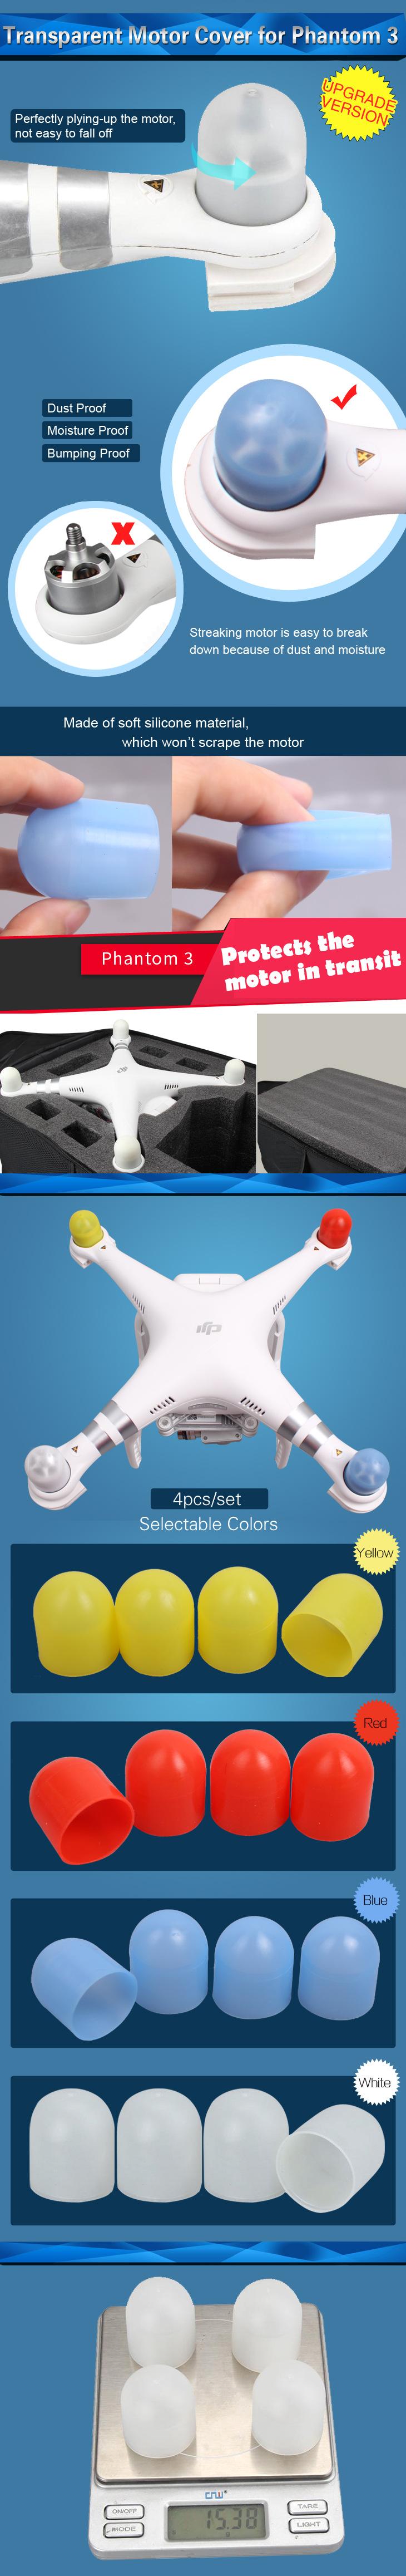 Free Shipping Transparent Motor Cover for DIJ Phantom 3 Rc Quadcopter Drone 4 color available